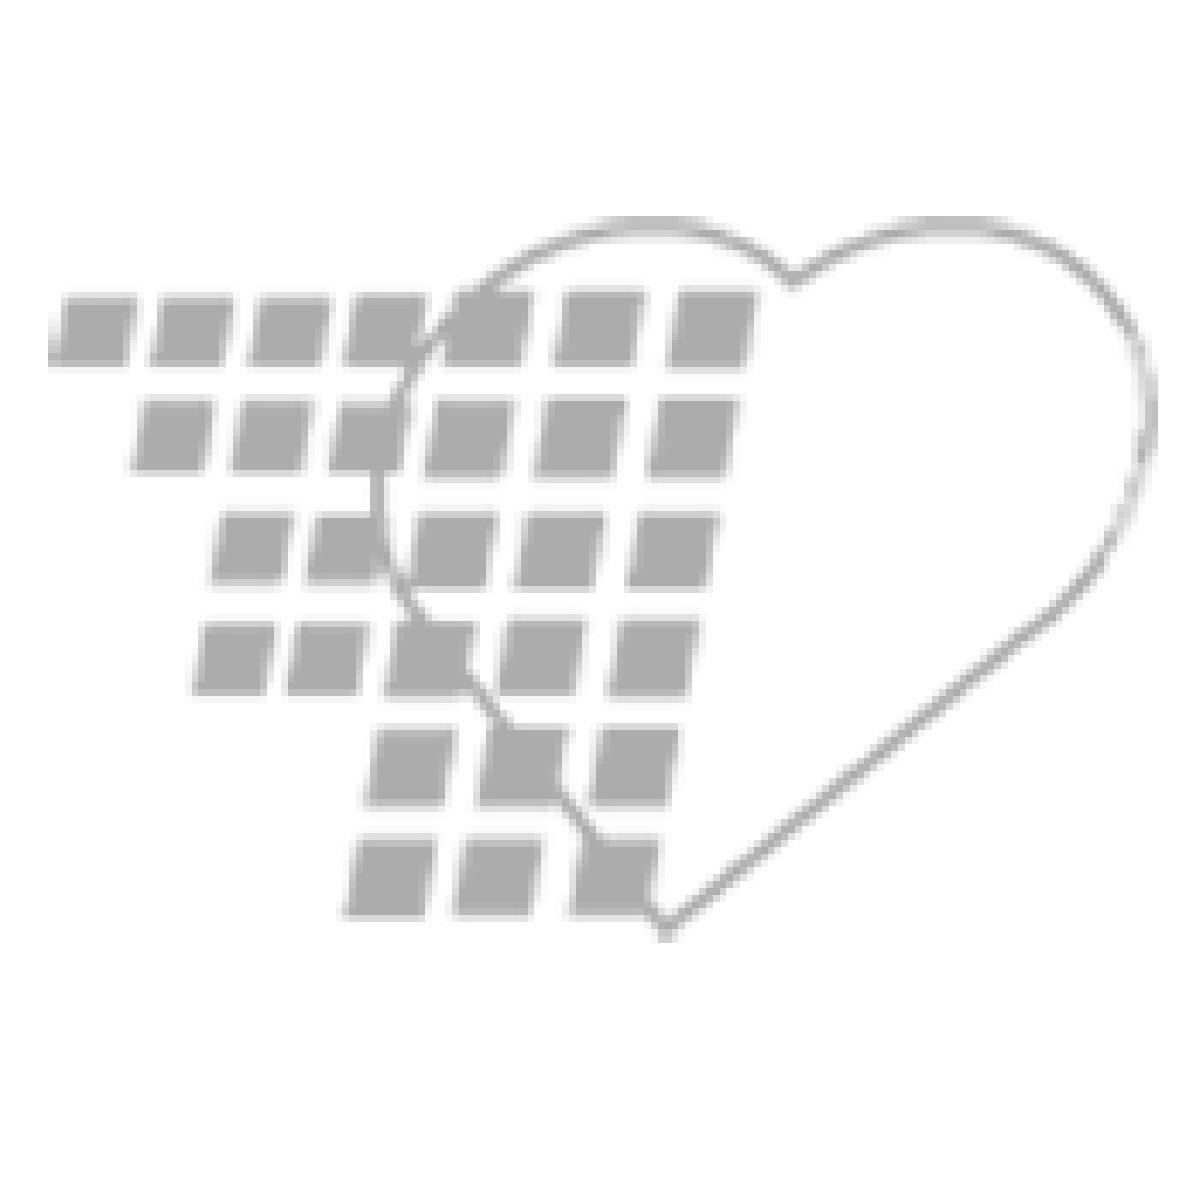 10-81-3205 Liver Pancreas & Duodenum Model